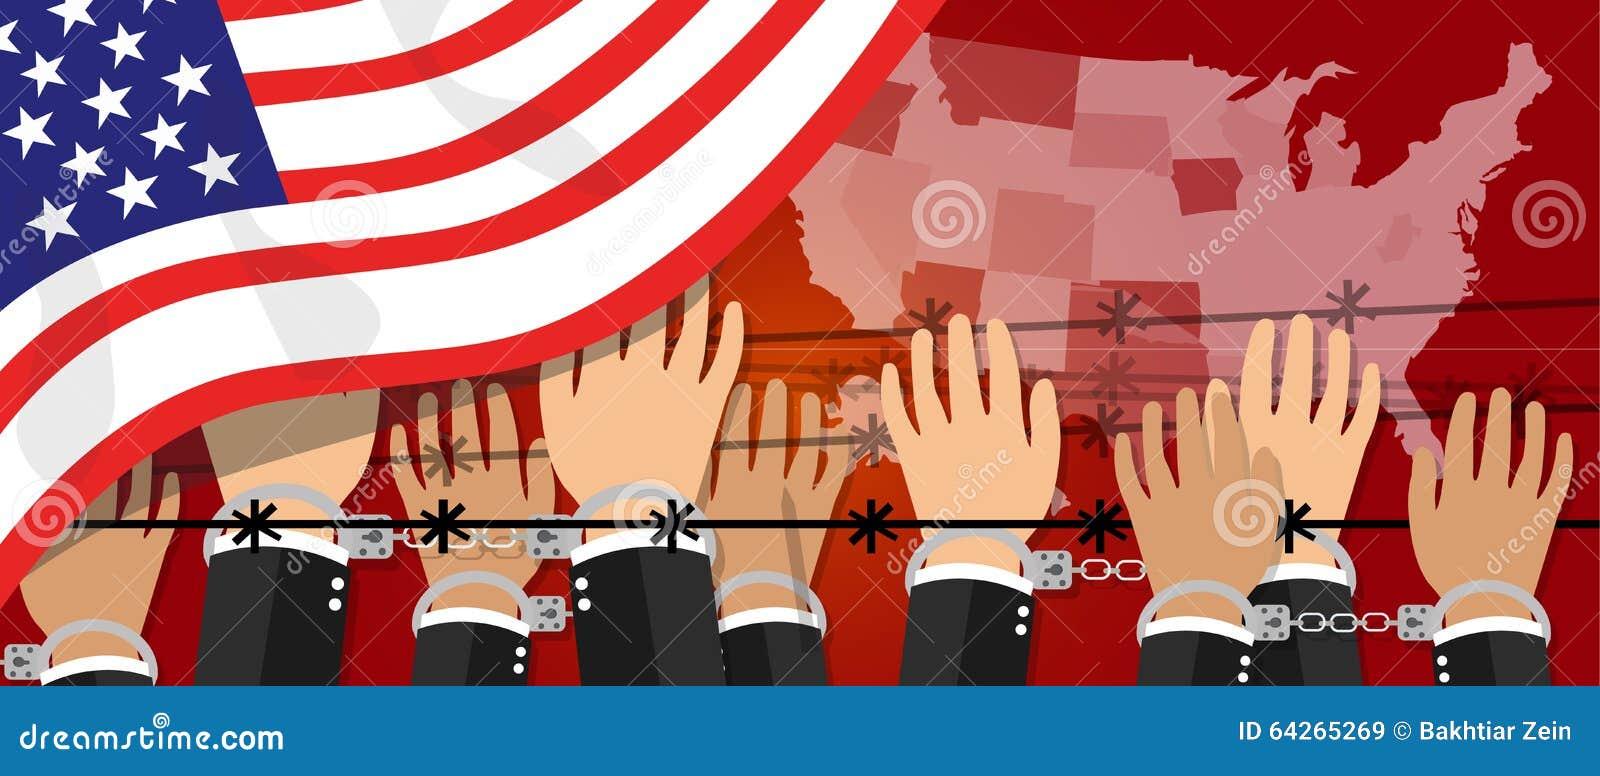 Royalty free download n s liberdade dos direitos humanos dos eua na democracia